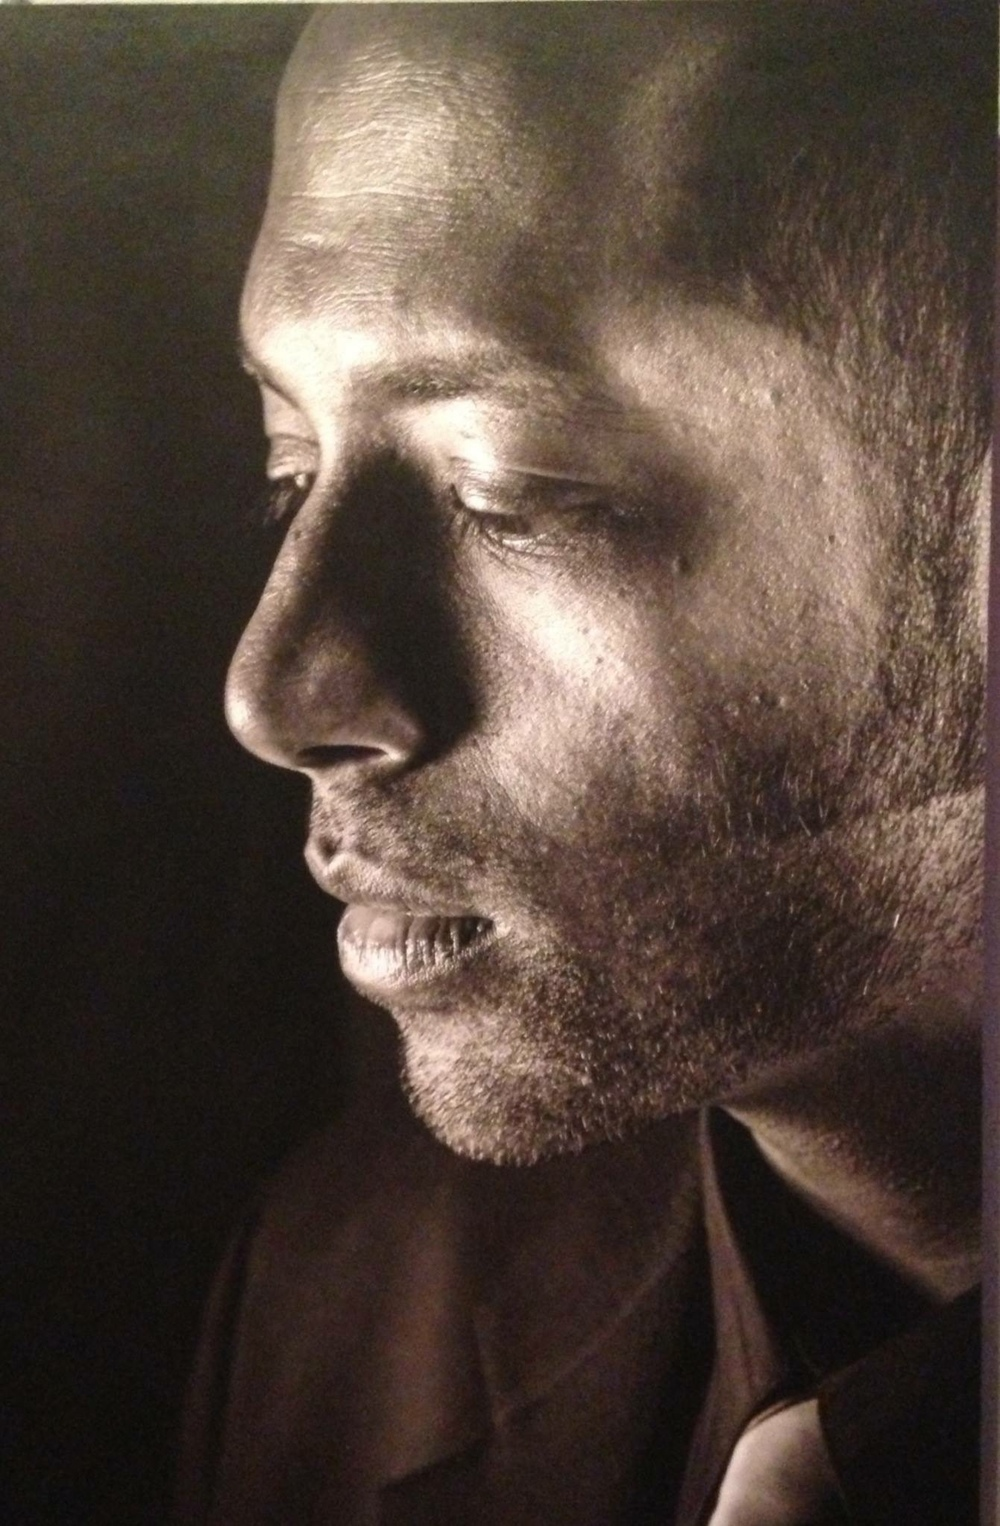 Portrait Courtesy of: Owen Carey Photography (c) 2014